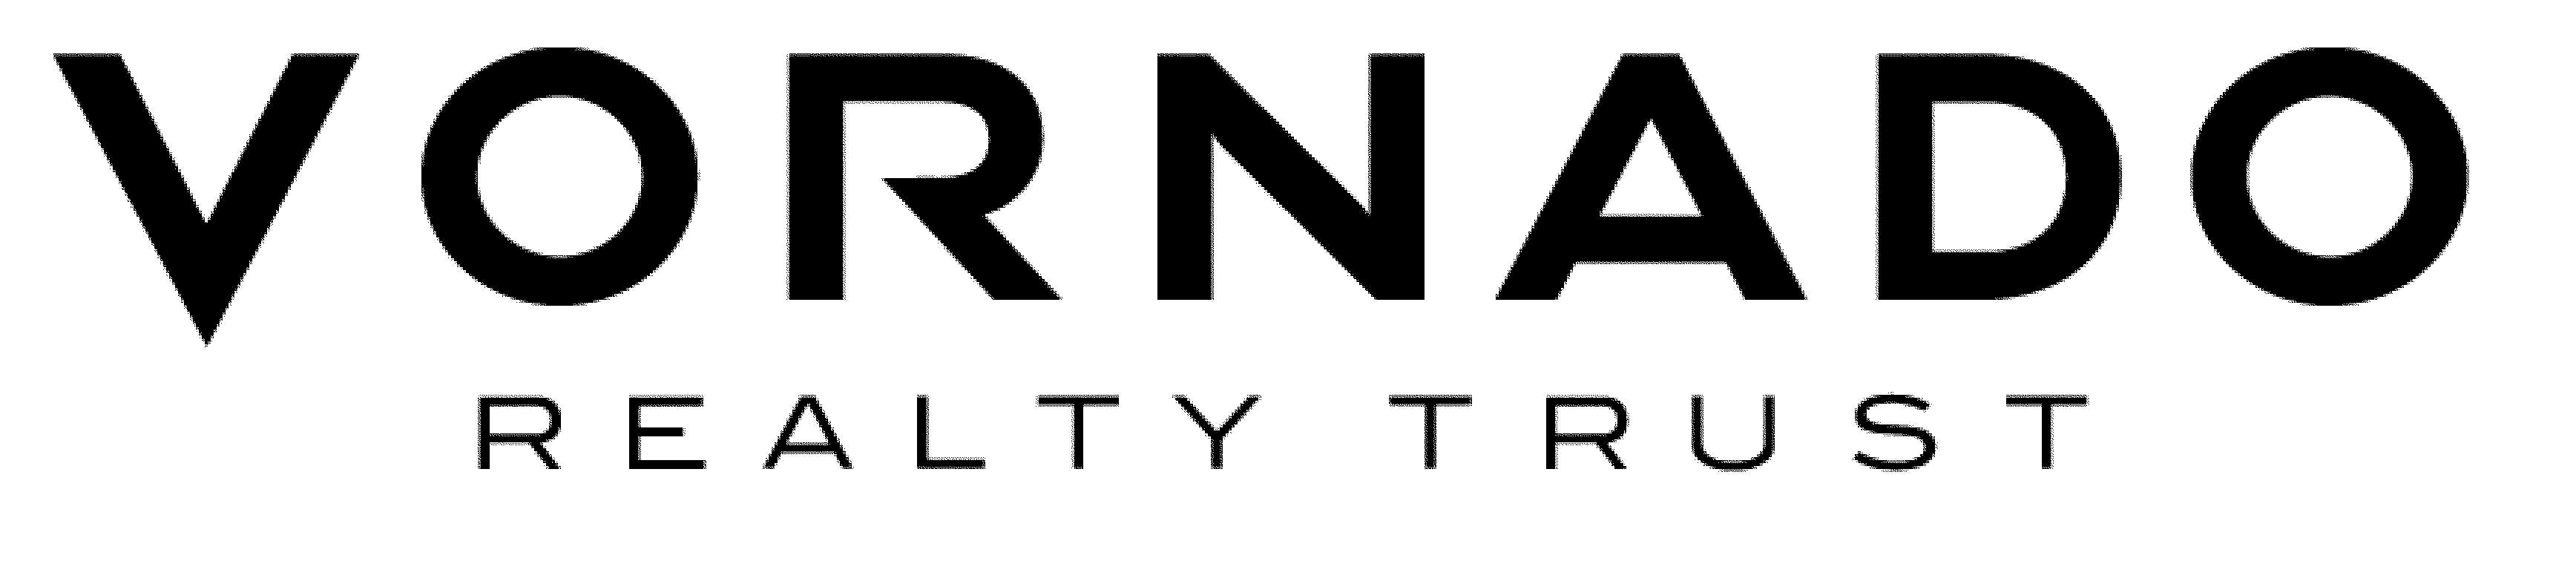 Vornado Realty Trust's